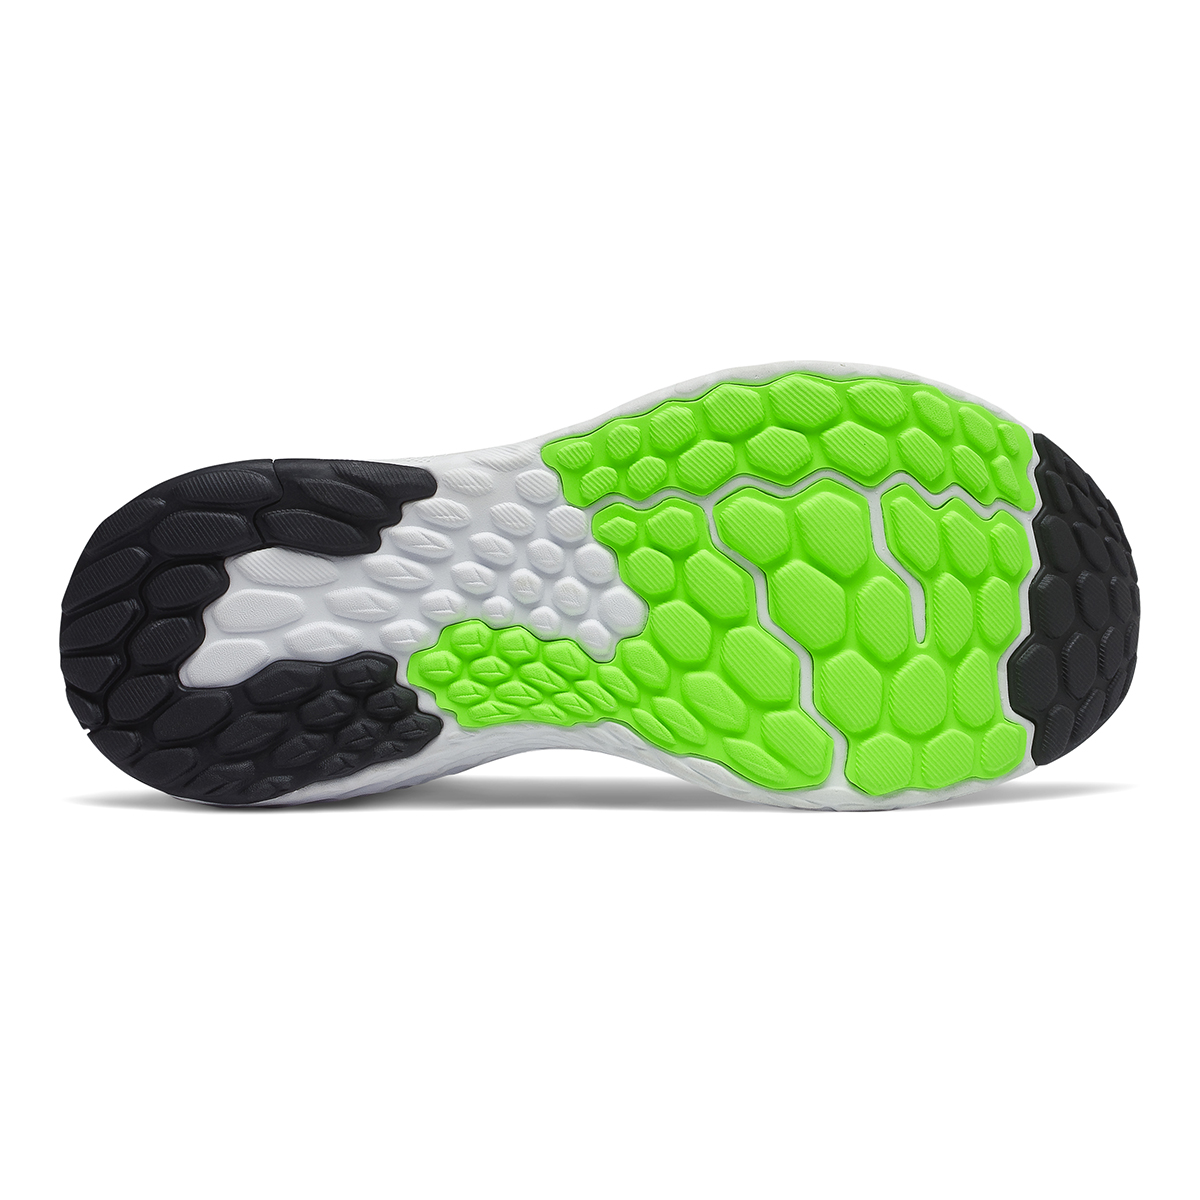 Men's New Balance Fresh Foam 1080v10 Running Shoe - Color: Light Aluminum - Size: 7 - Width: Wide, Light Aluminum, large, image 4